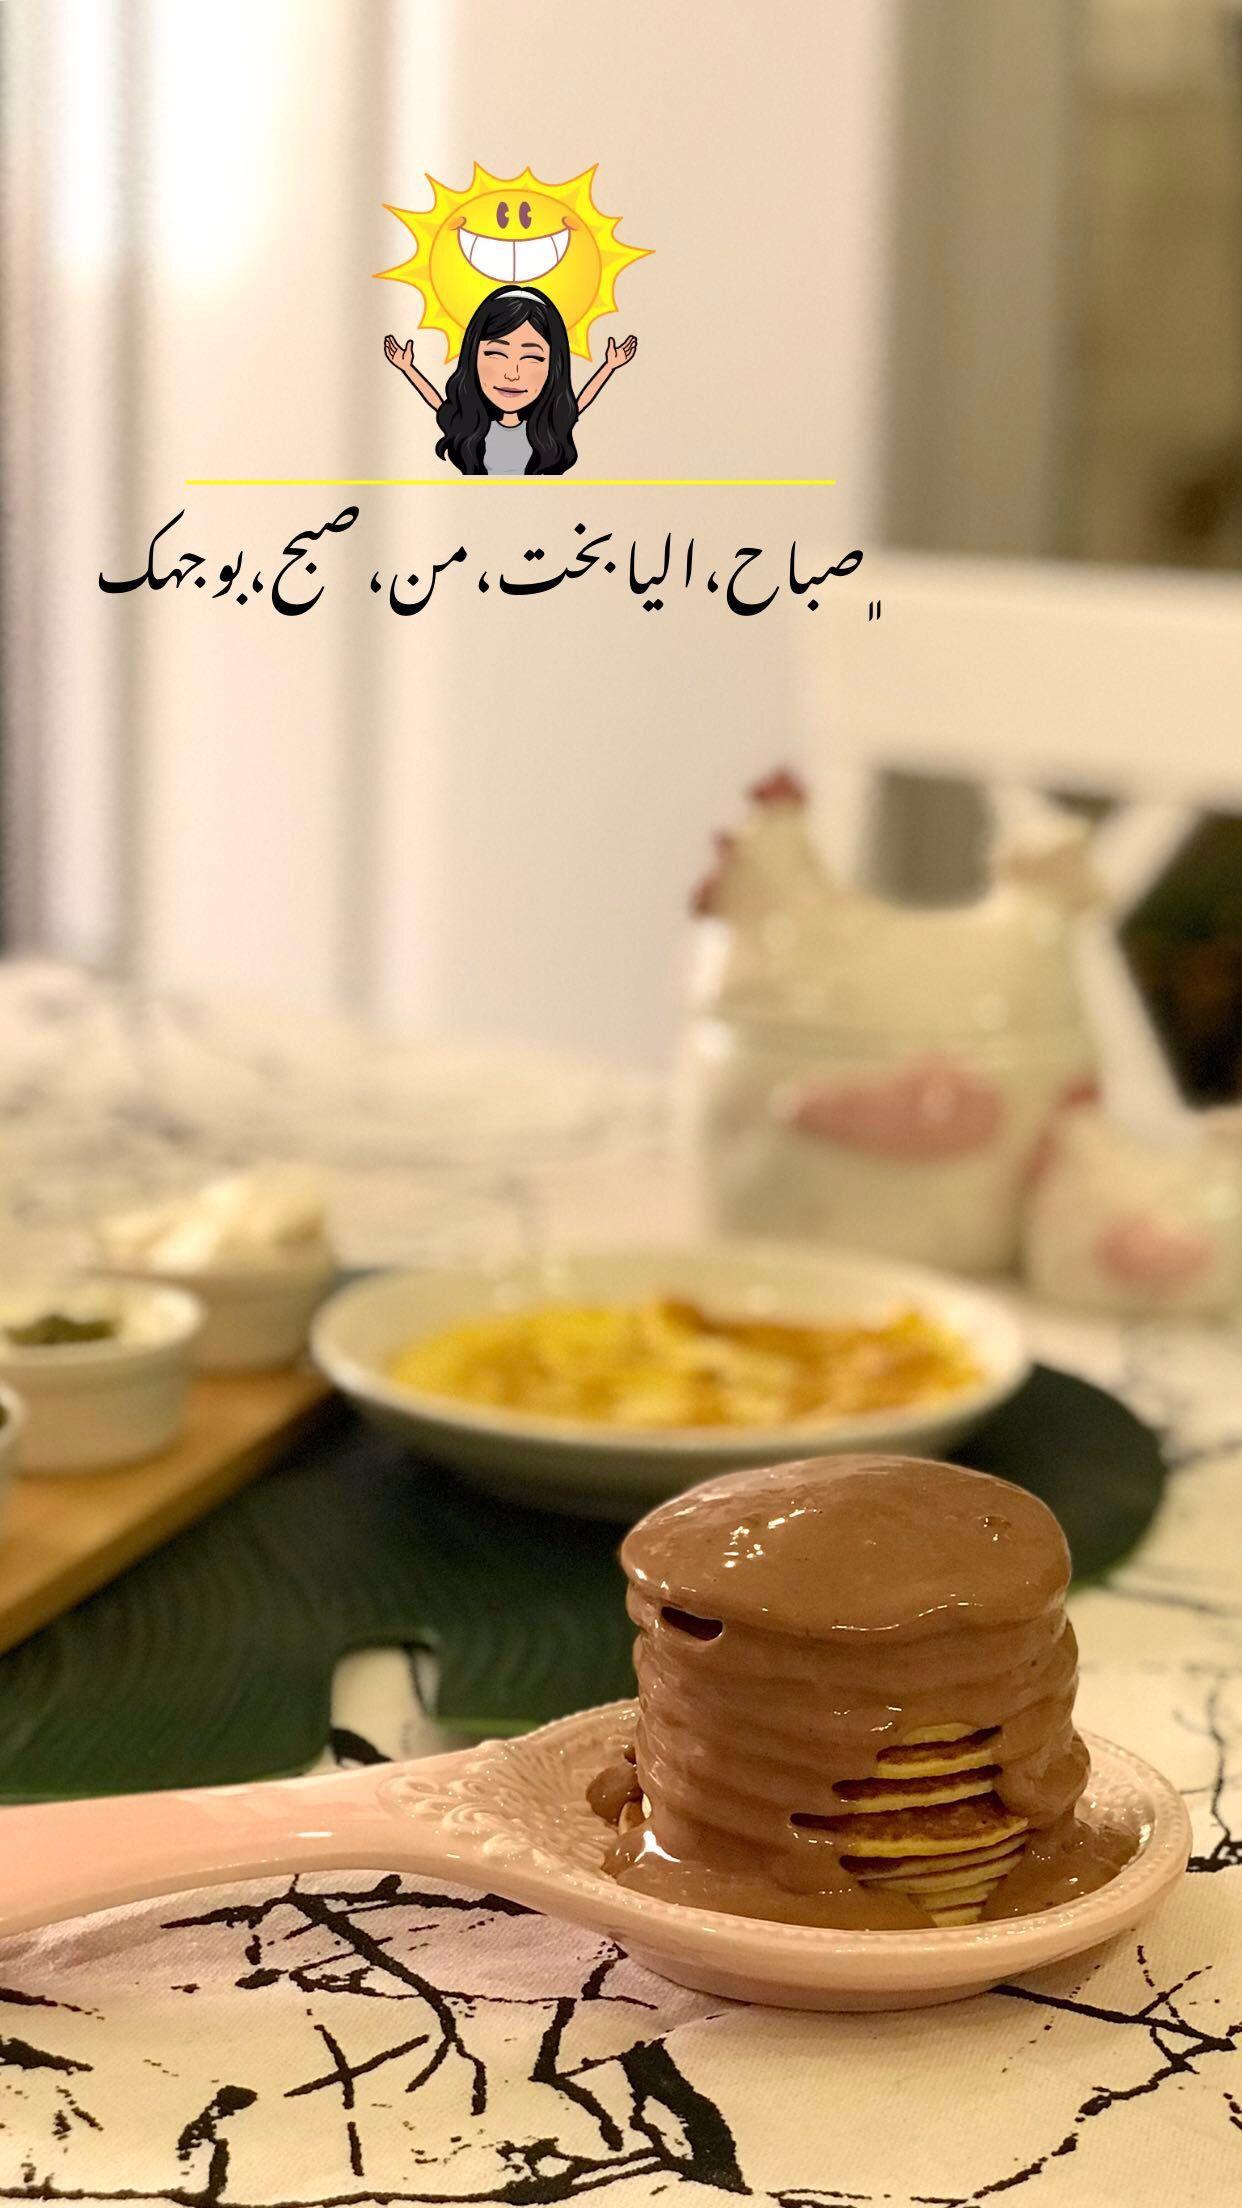 تصويري تصوير روقان سنابيات سناب صباح صباح الخير صباحيات فطور Funny Arabic Quotes Snapchat Quotes Arabic Love Quotes